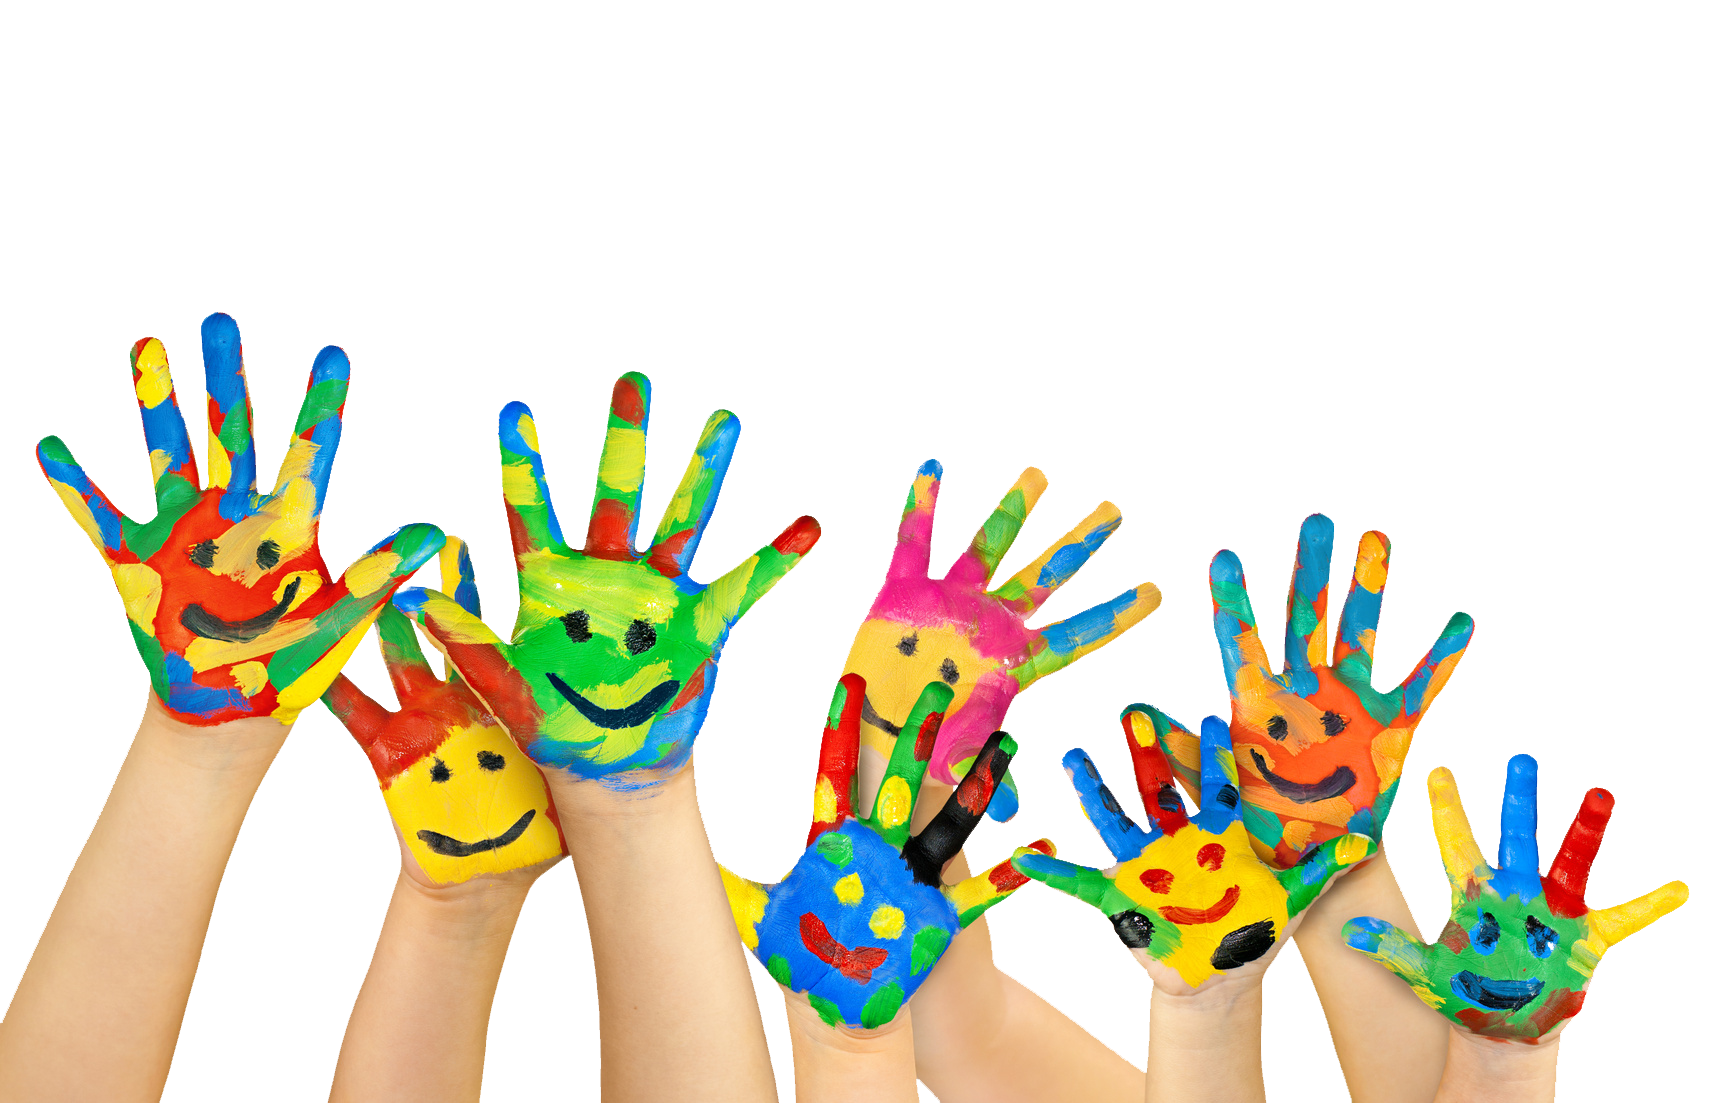 Preschool clipart portfolio. Conyers first united methodist